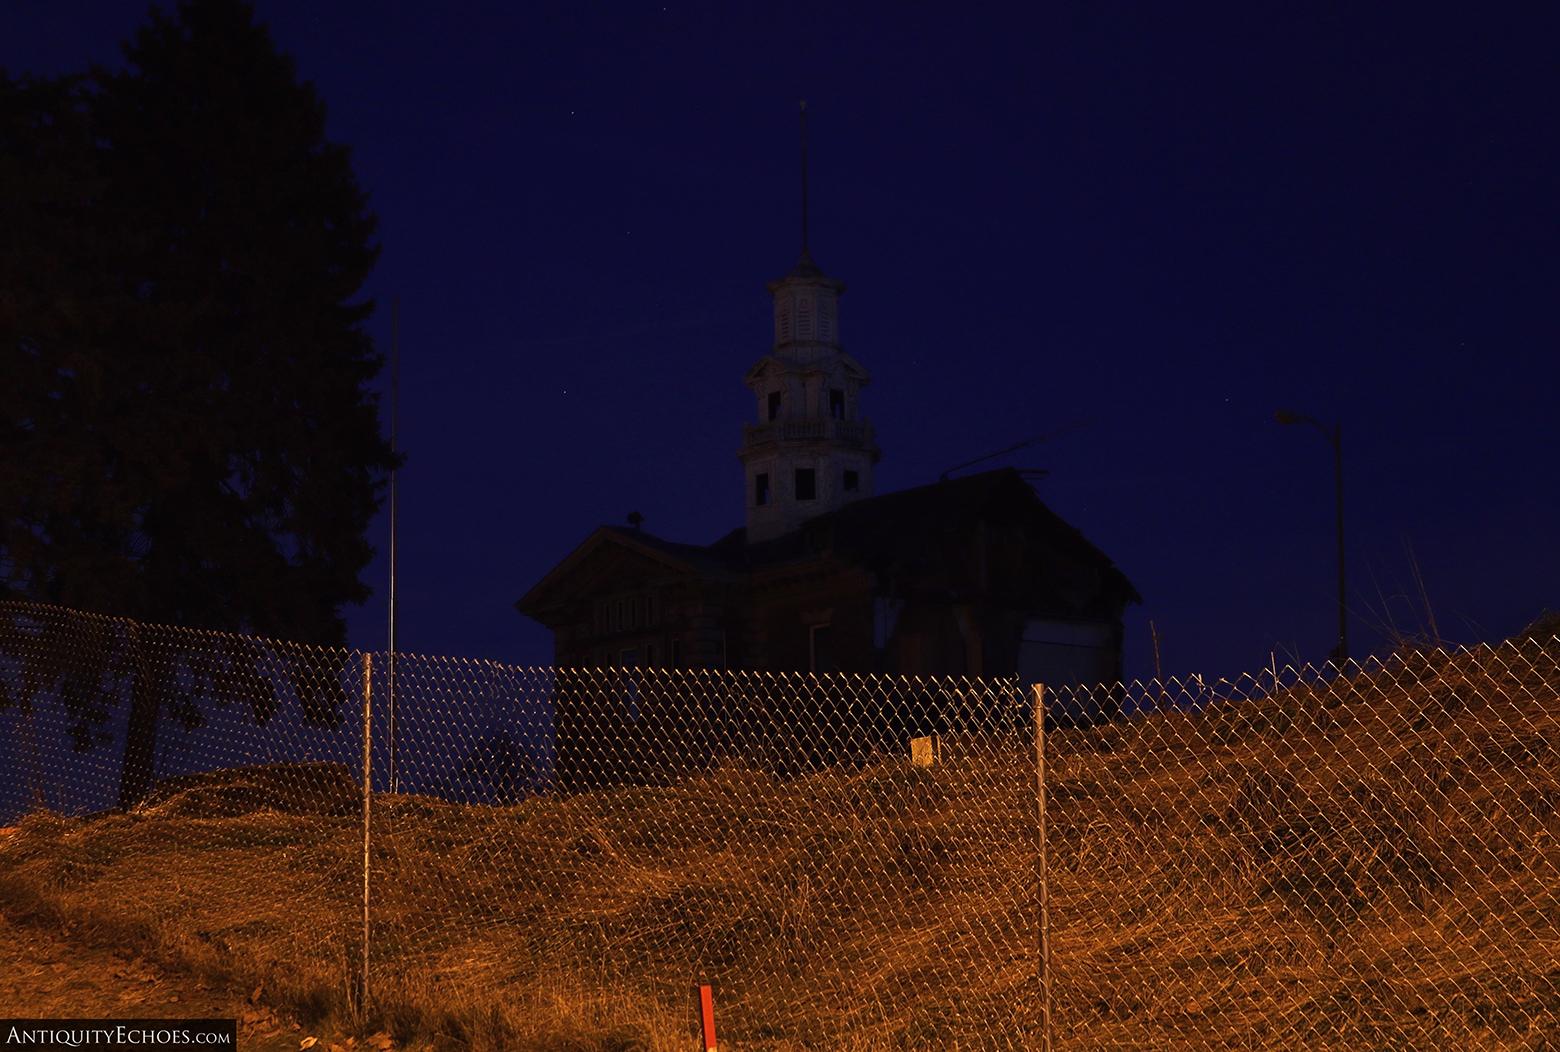 Allentown State Hospital - Demolition - The Last Night